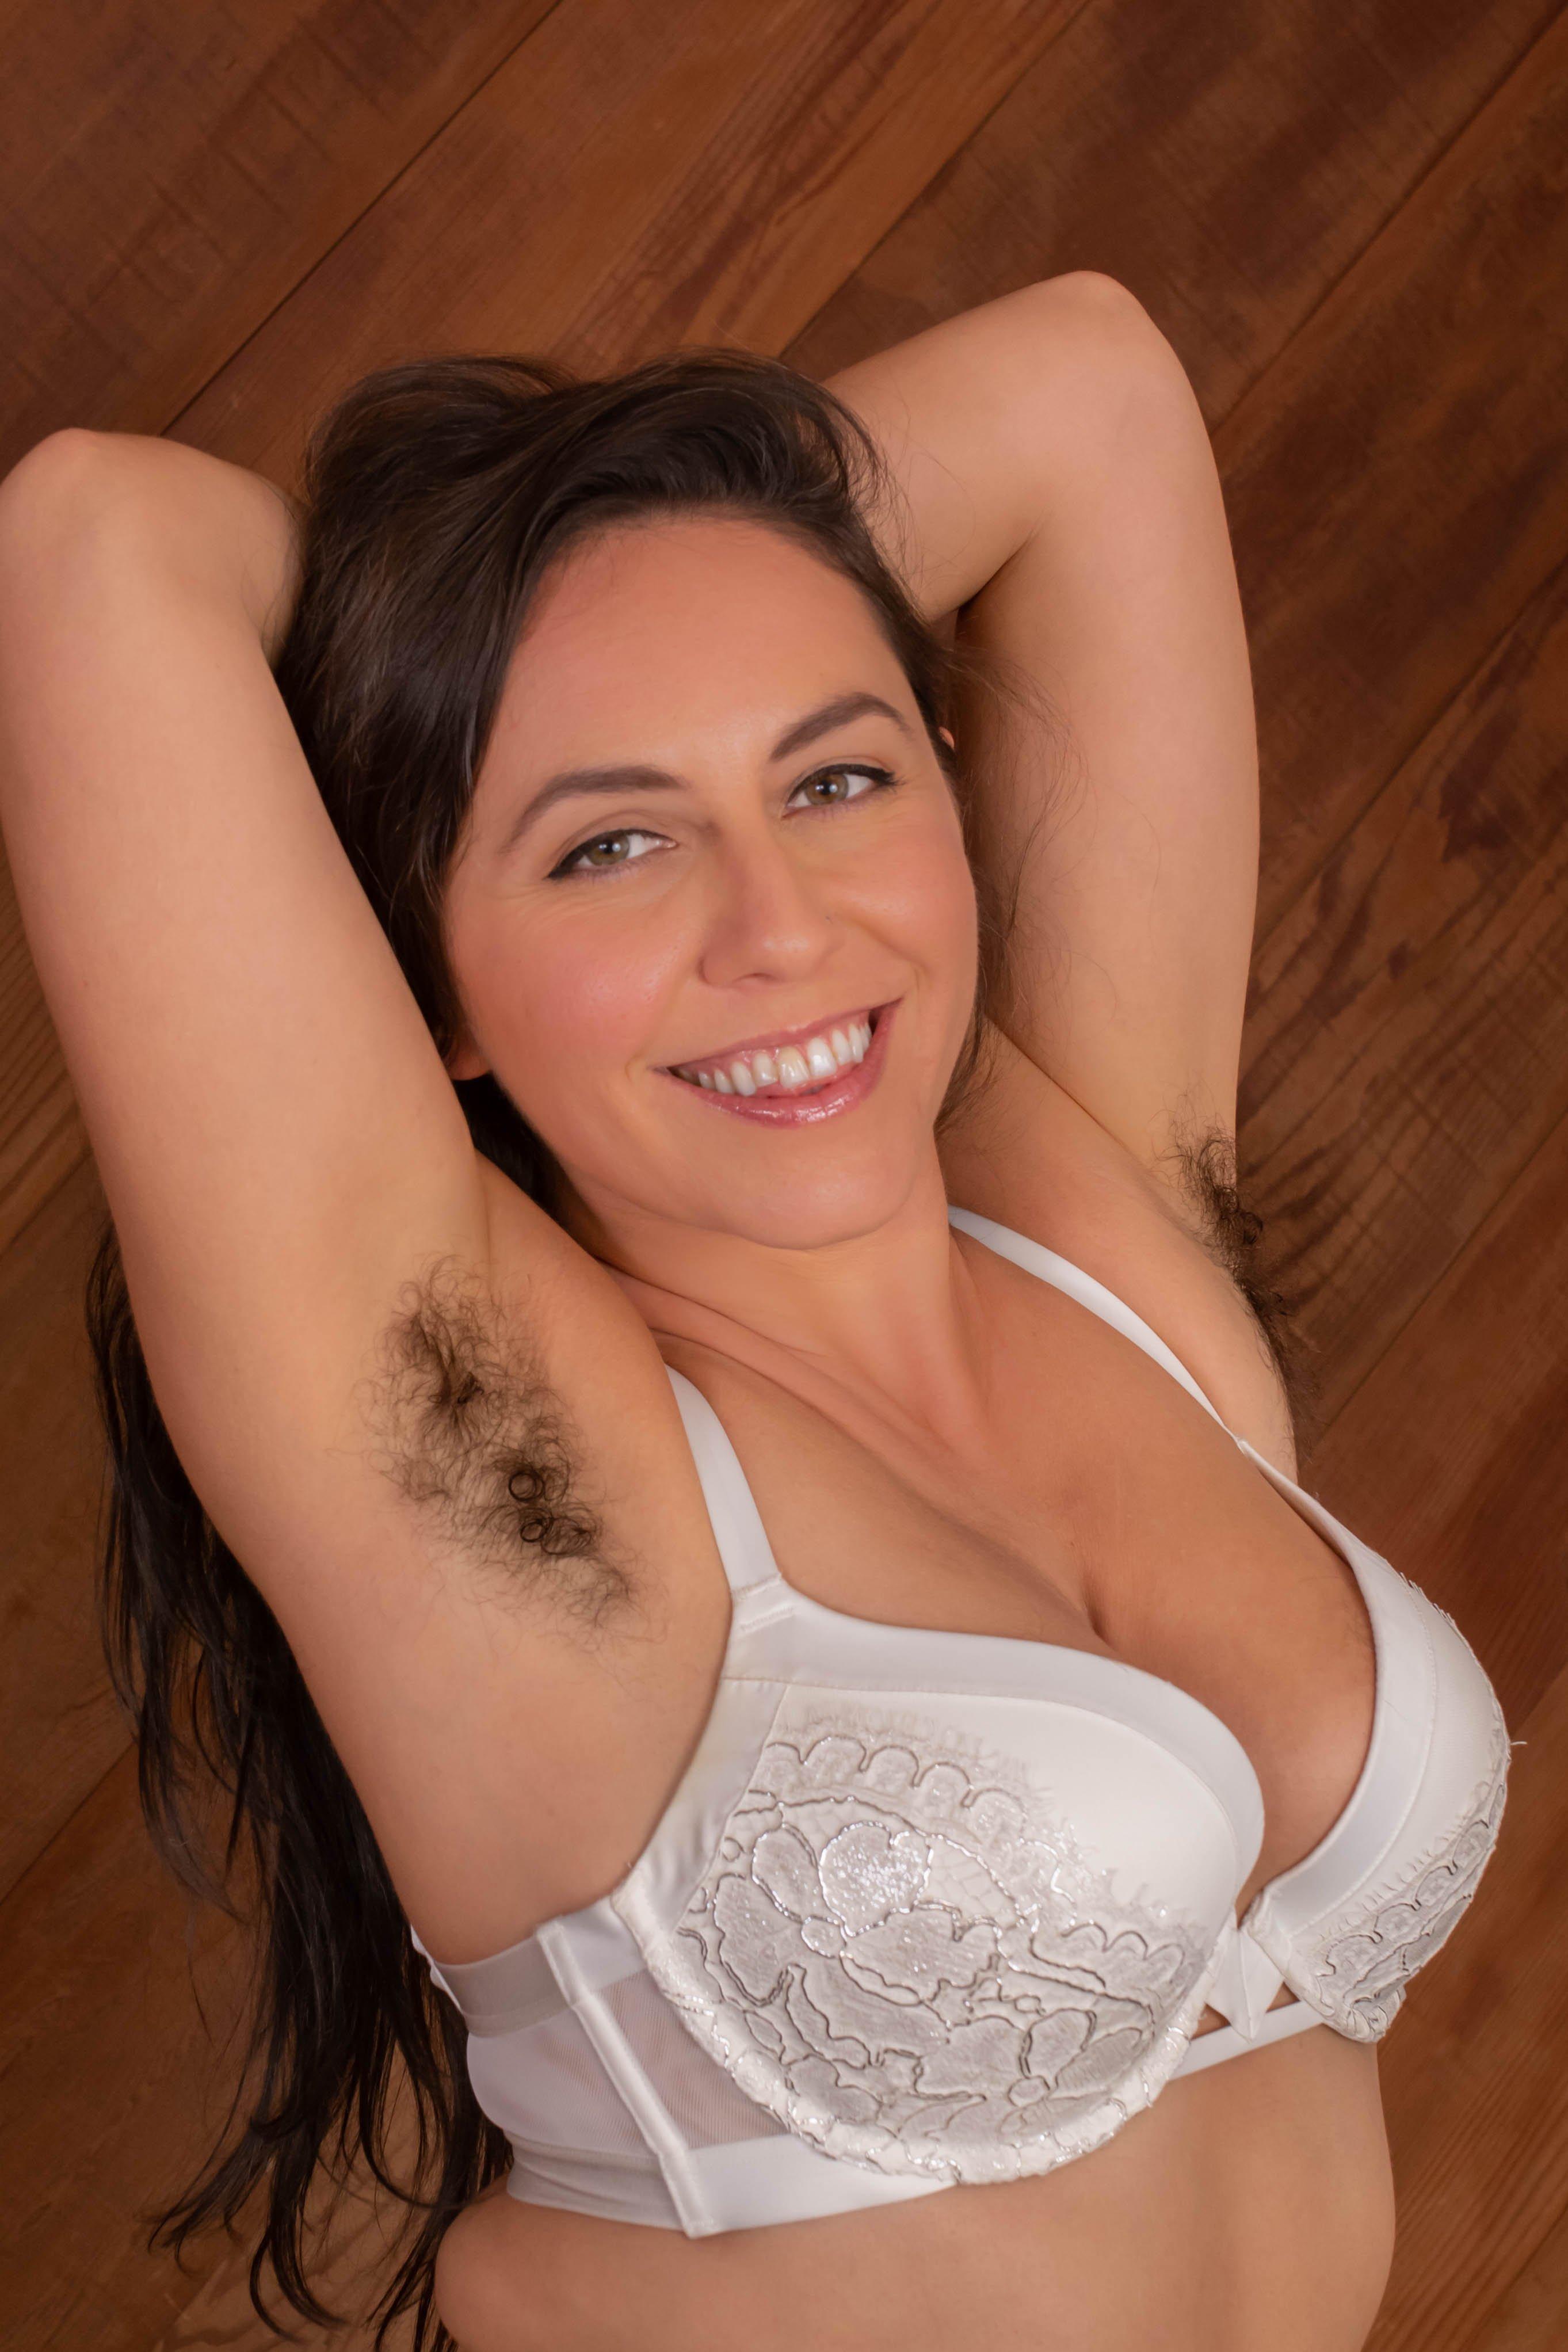 Nikki Silver Porn naughtynatural - ownednikki silver (@naughtyxnatural